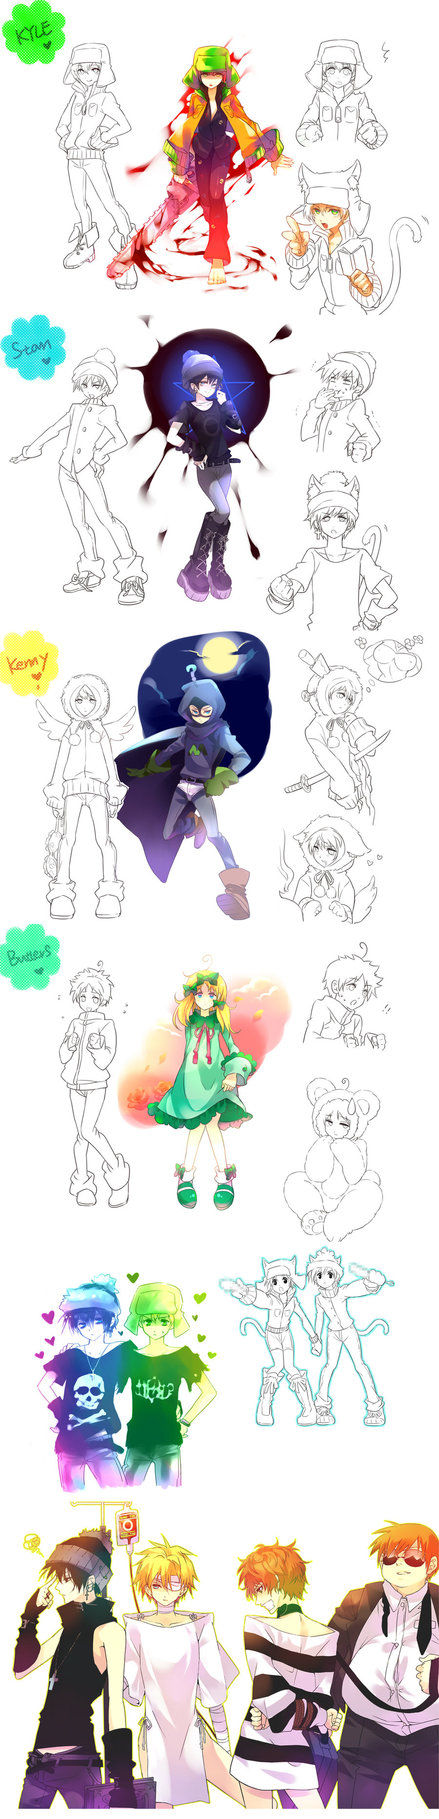 Tags: Anime, Saru (Pixiv1267140), South Park, Stanley Randall Marsh, Eric Theodore Cartman, Raven (South Park), Kyle Broflovski, Leopold Stotch, Mysterion, Kenneth McCormick, Marjorine, Chainsaw